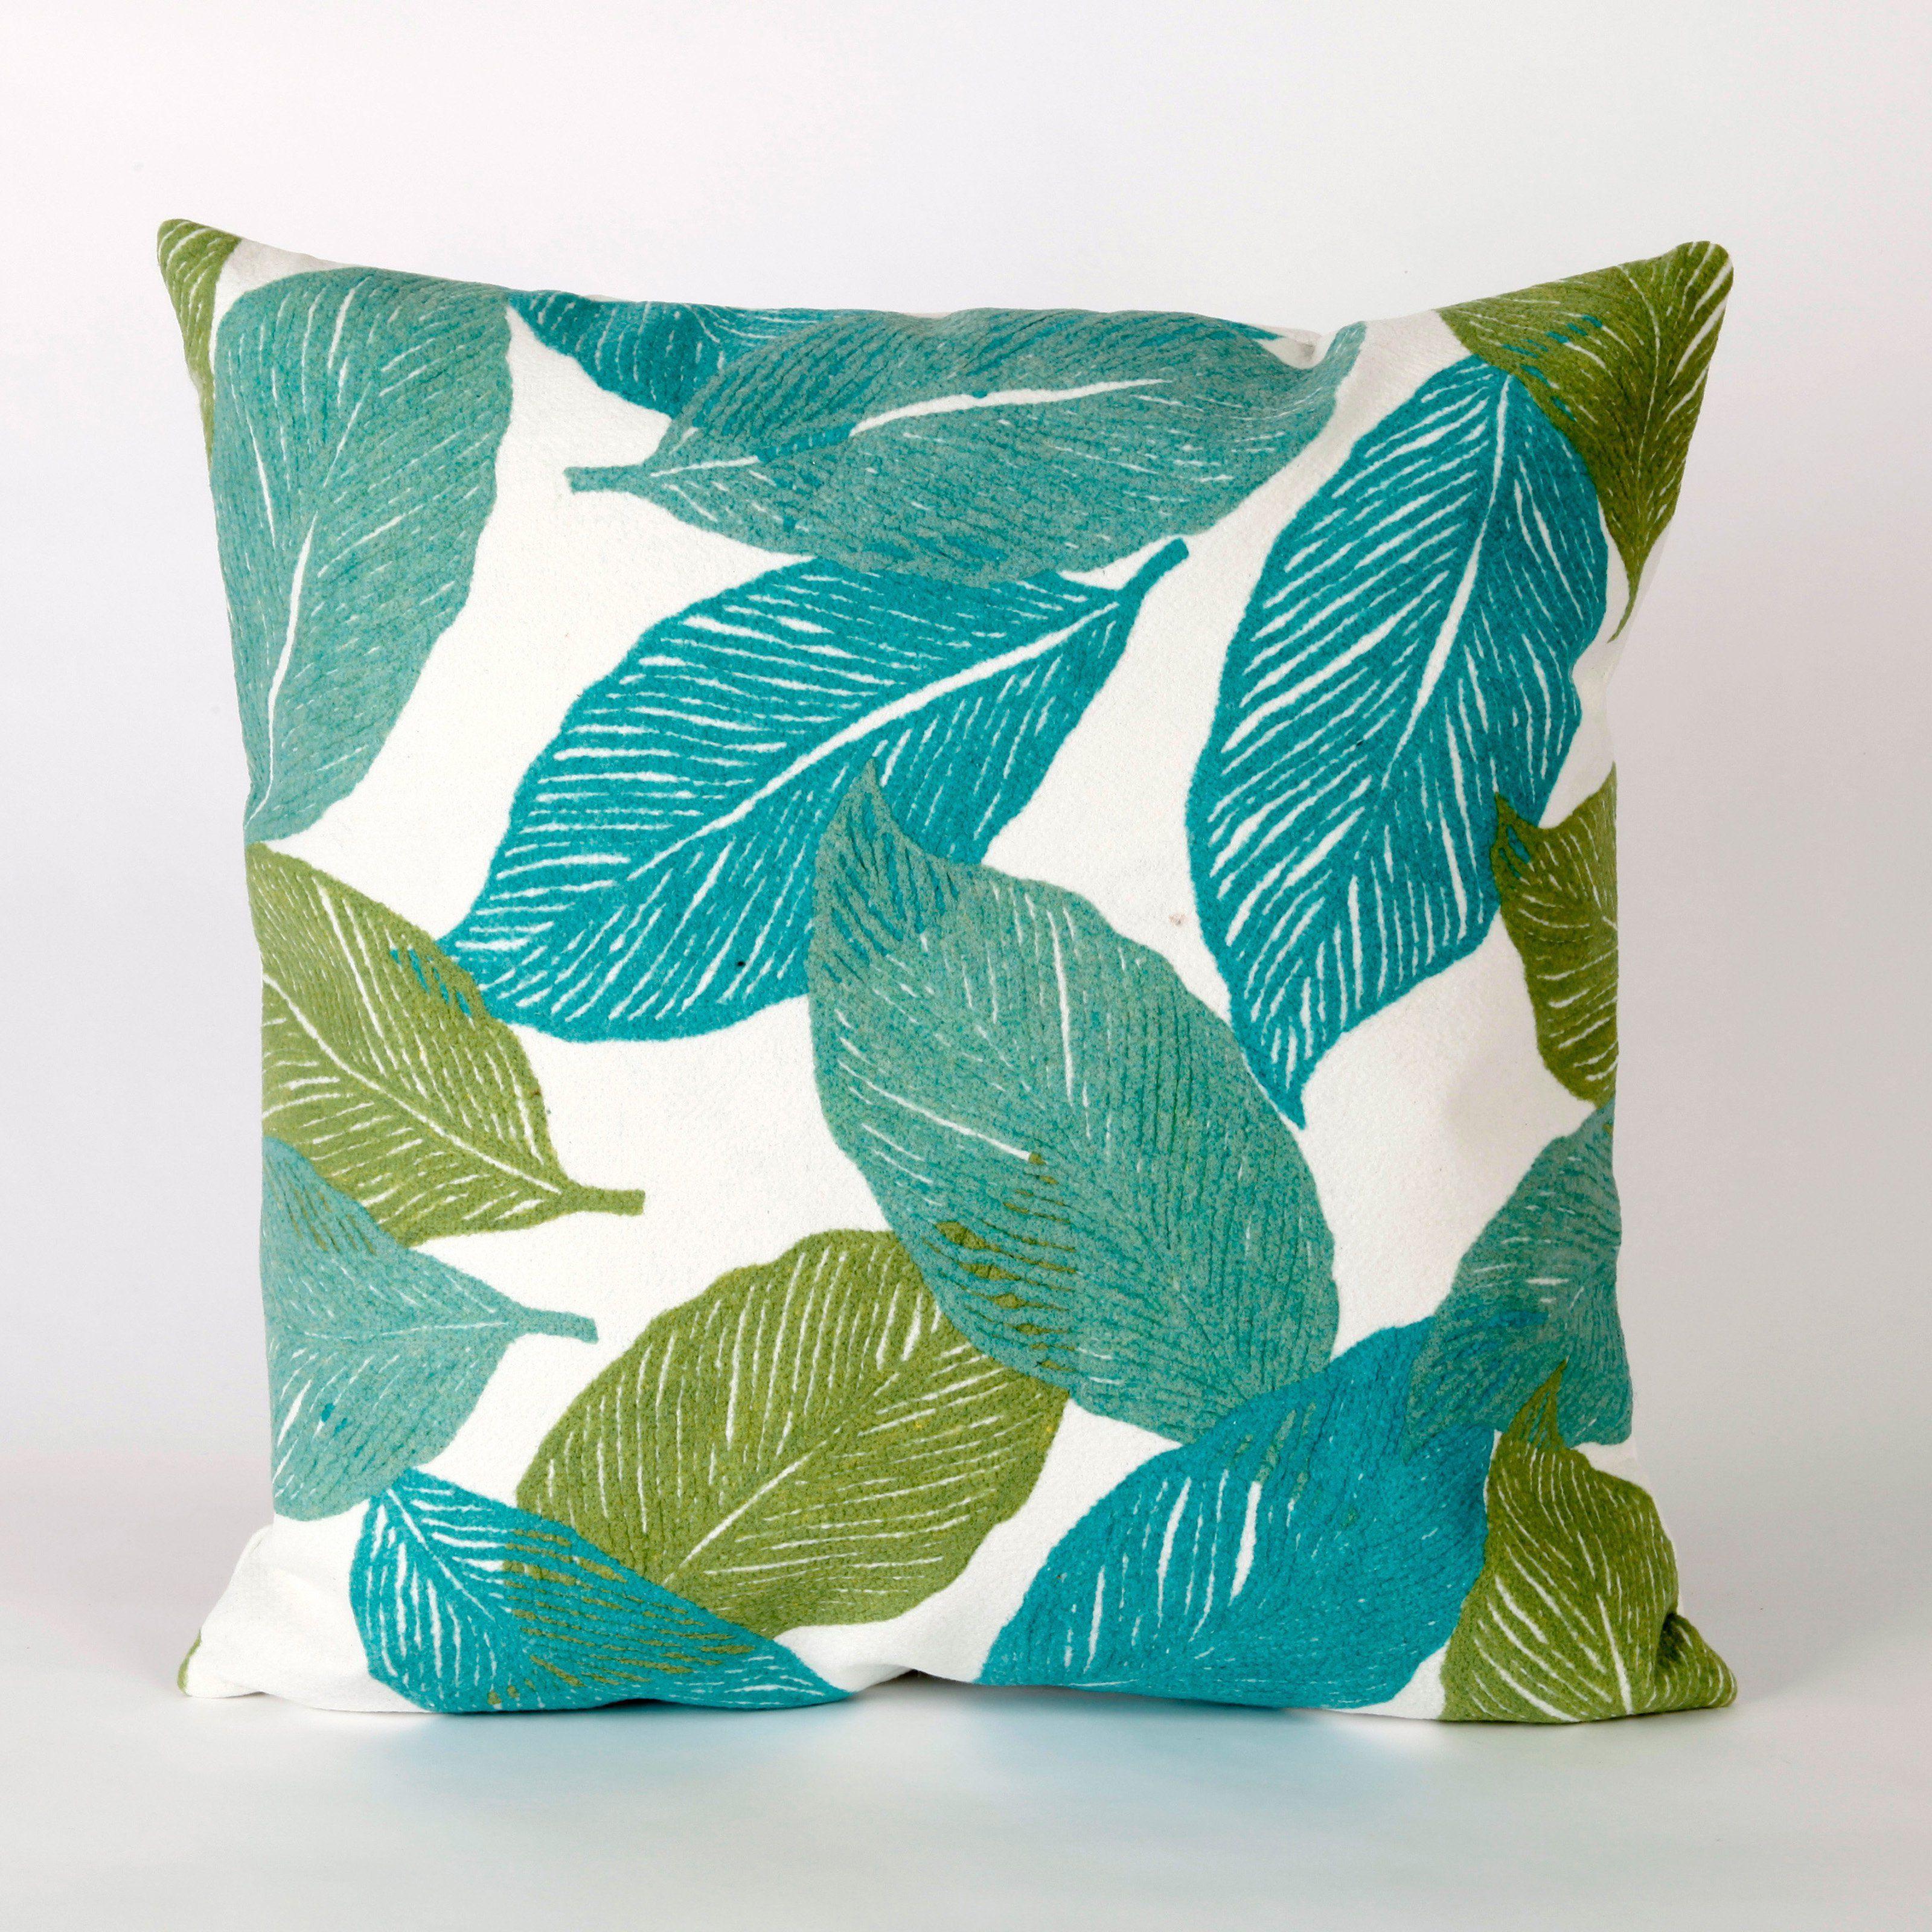 Liora Manne Mystic Leaf Indoor Outdoor Throw Pillow Aqua Pillows Throw Pillows Outdoor Throw Pillows